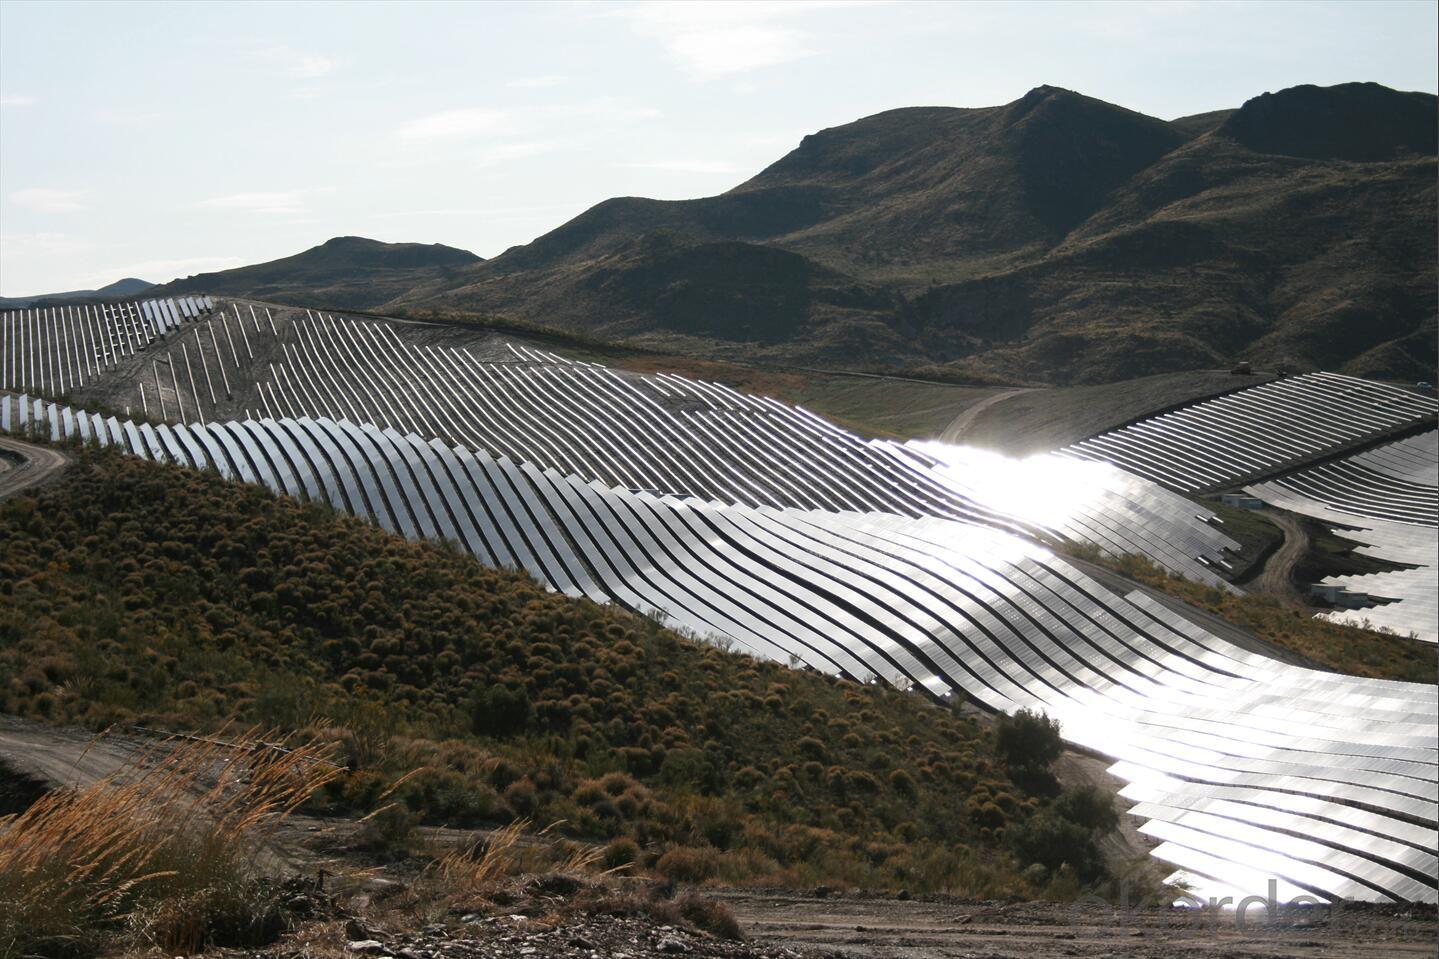 TPB156×156-72-P 305Wp Poly Silicon Solar Module